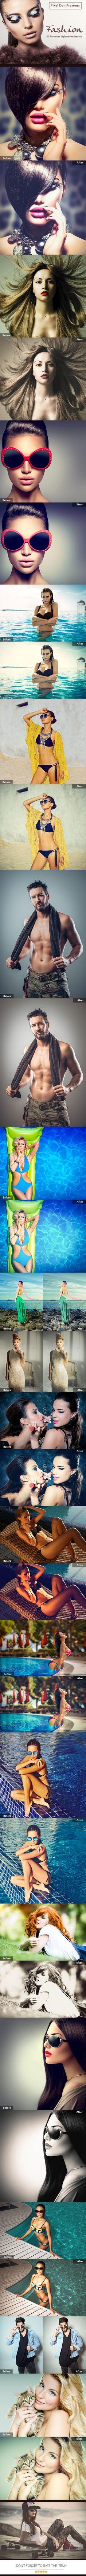 50 Premium Fashion Lightroom Presets. Download here: http://graphicriver.net/item/50-premium-fashion-lightroom-presets/16587482?ref=ksioks